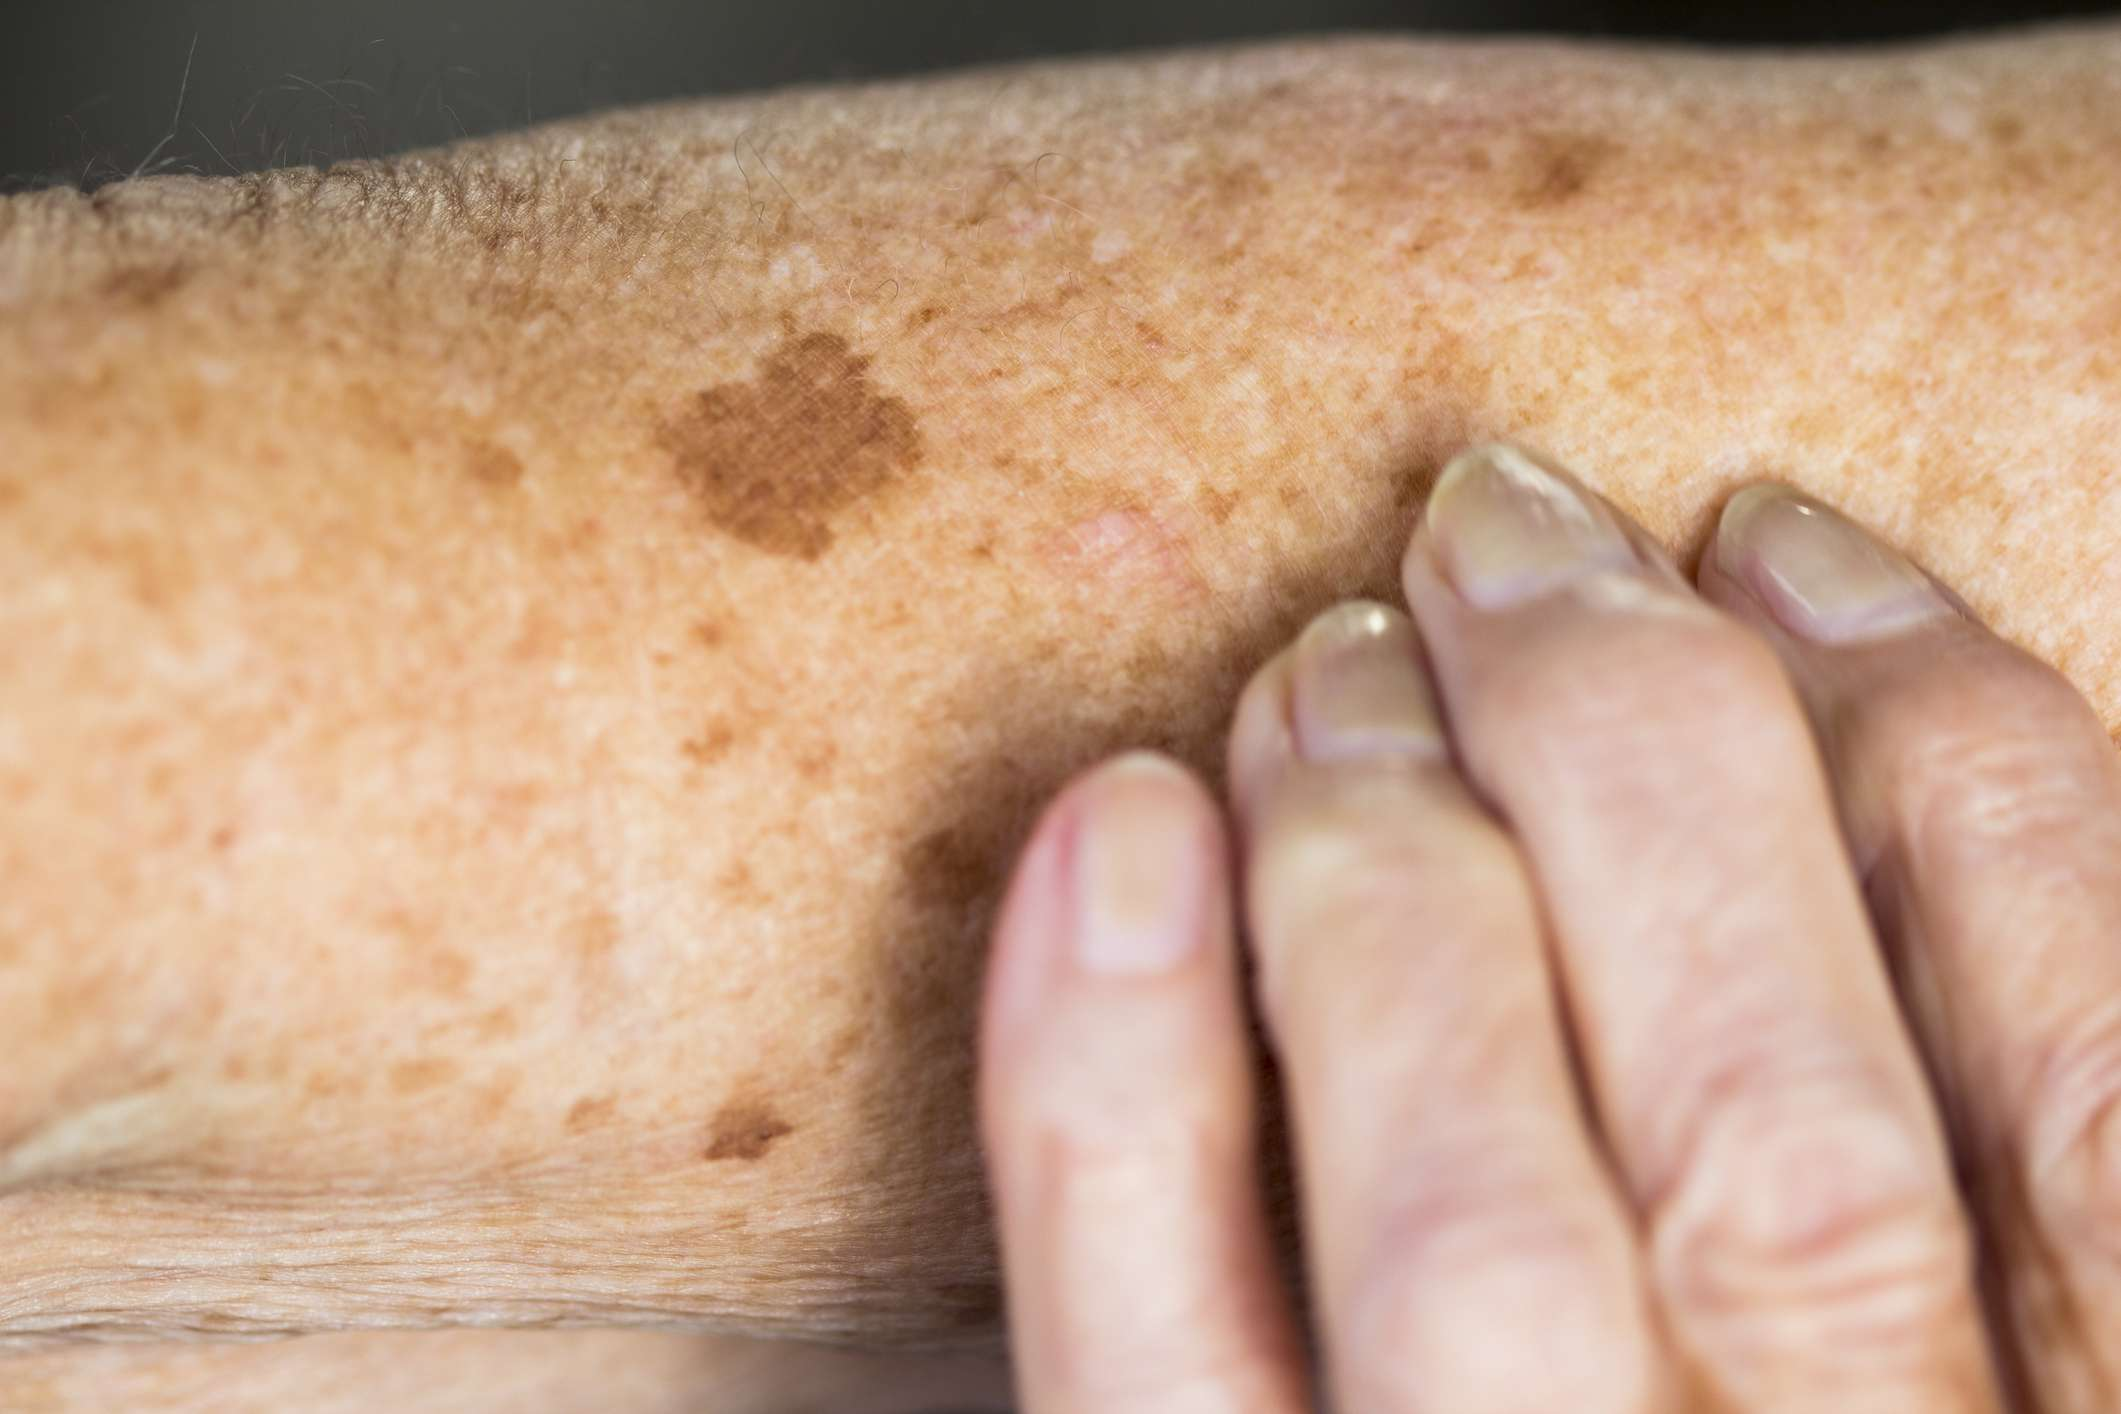 Liver spots, or age spots, on an elderly woman's skin.